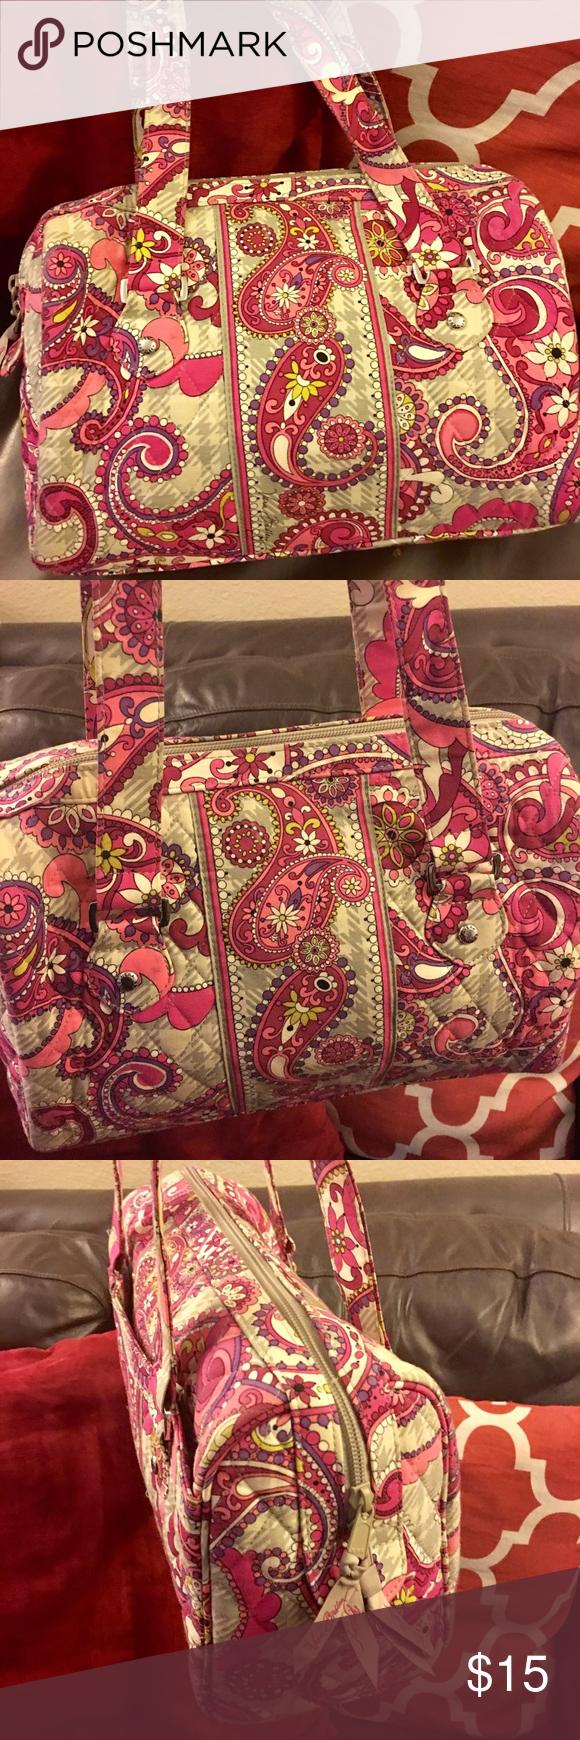 🎉SALE🎉VERA BRADLEY Super Cute Paisley Print Bag